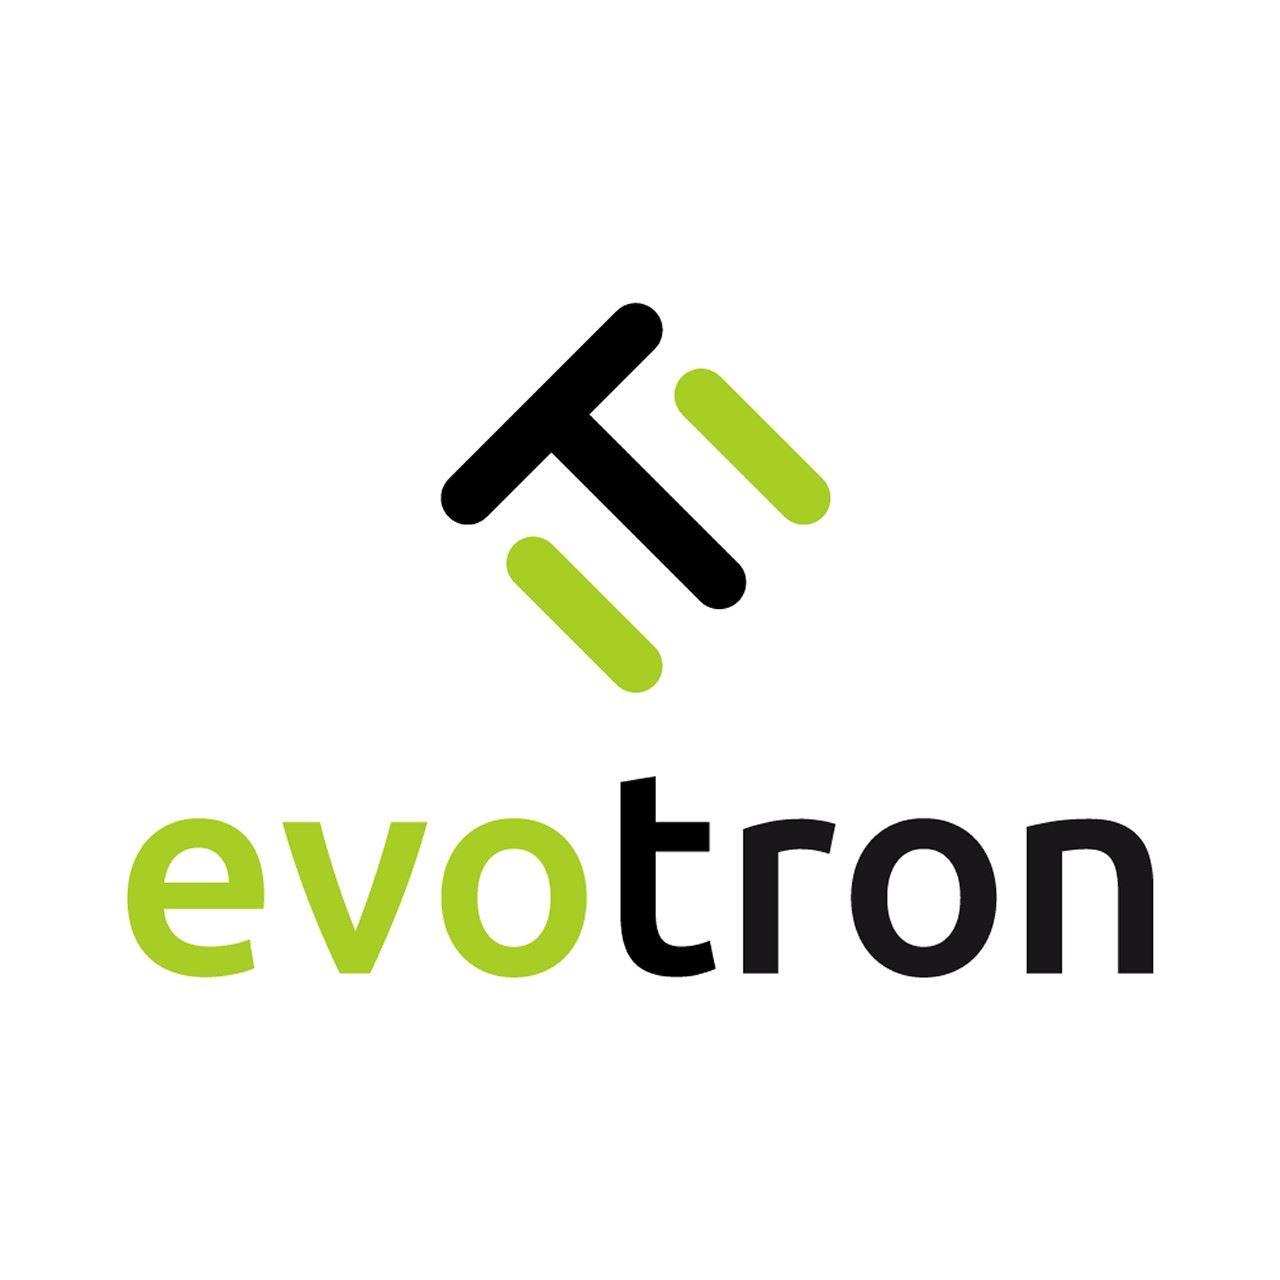 evotron GmbH & Co. KG